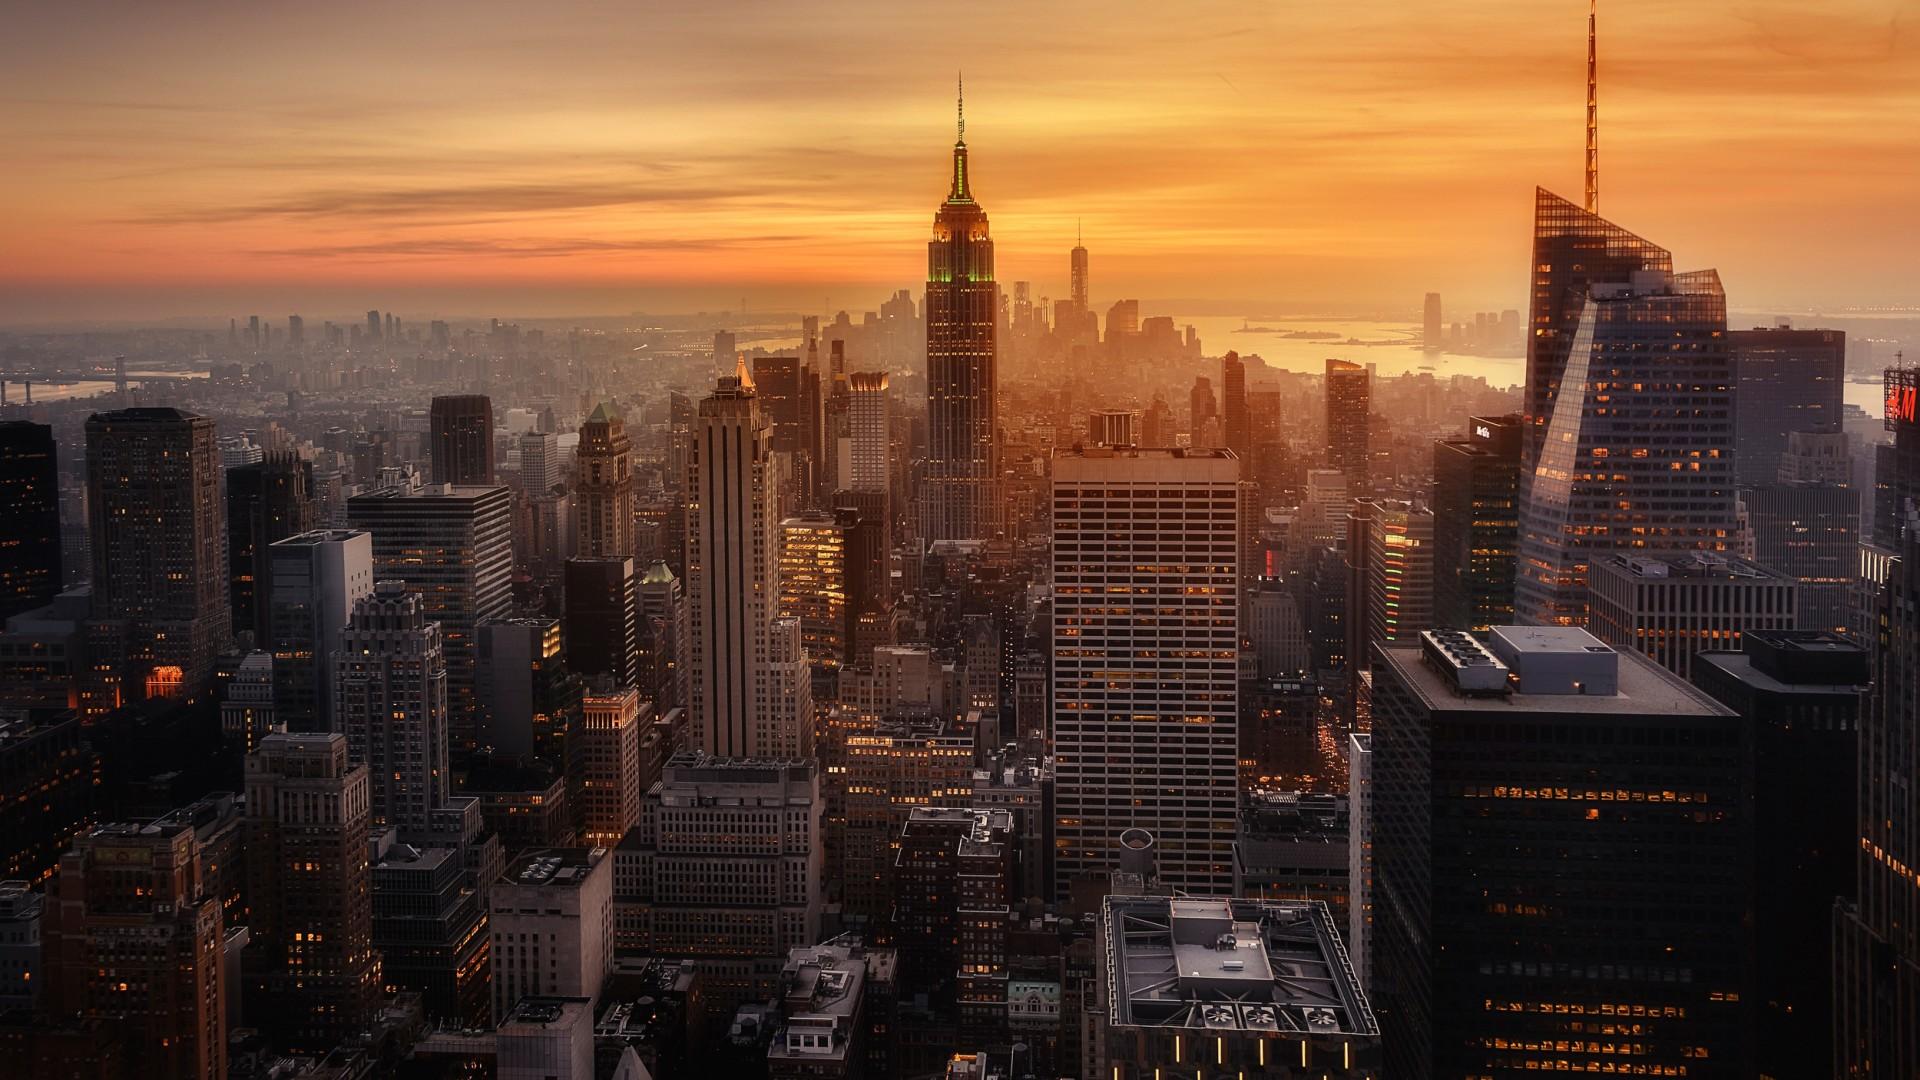 New York City Evening Time Laptop Full Hd 1080p Hd New York City 1920x1080 Download Hd Wallpaper Wallpapertip